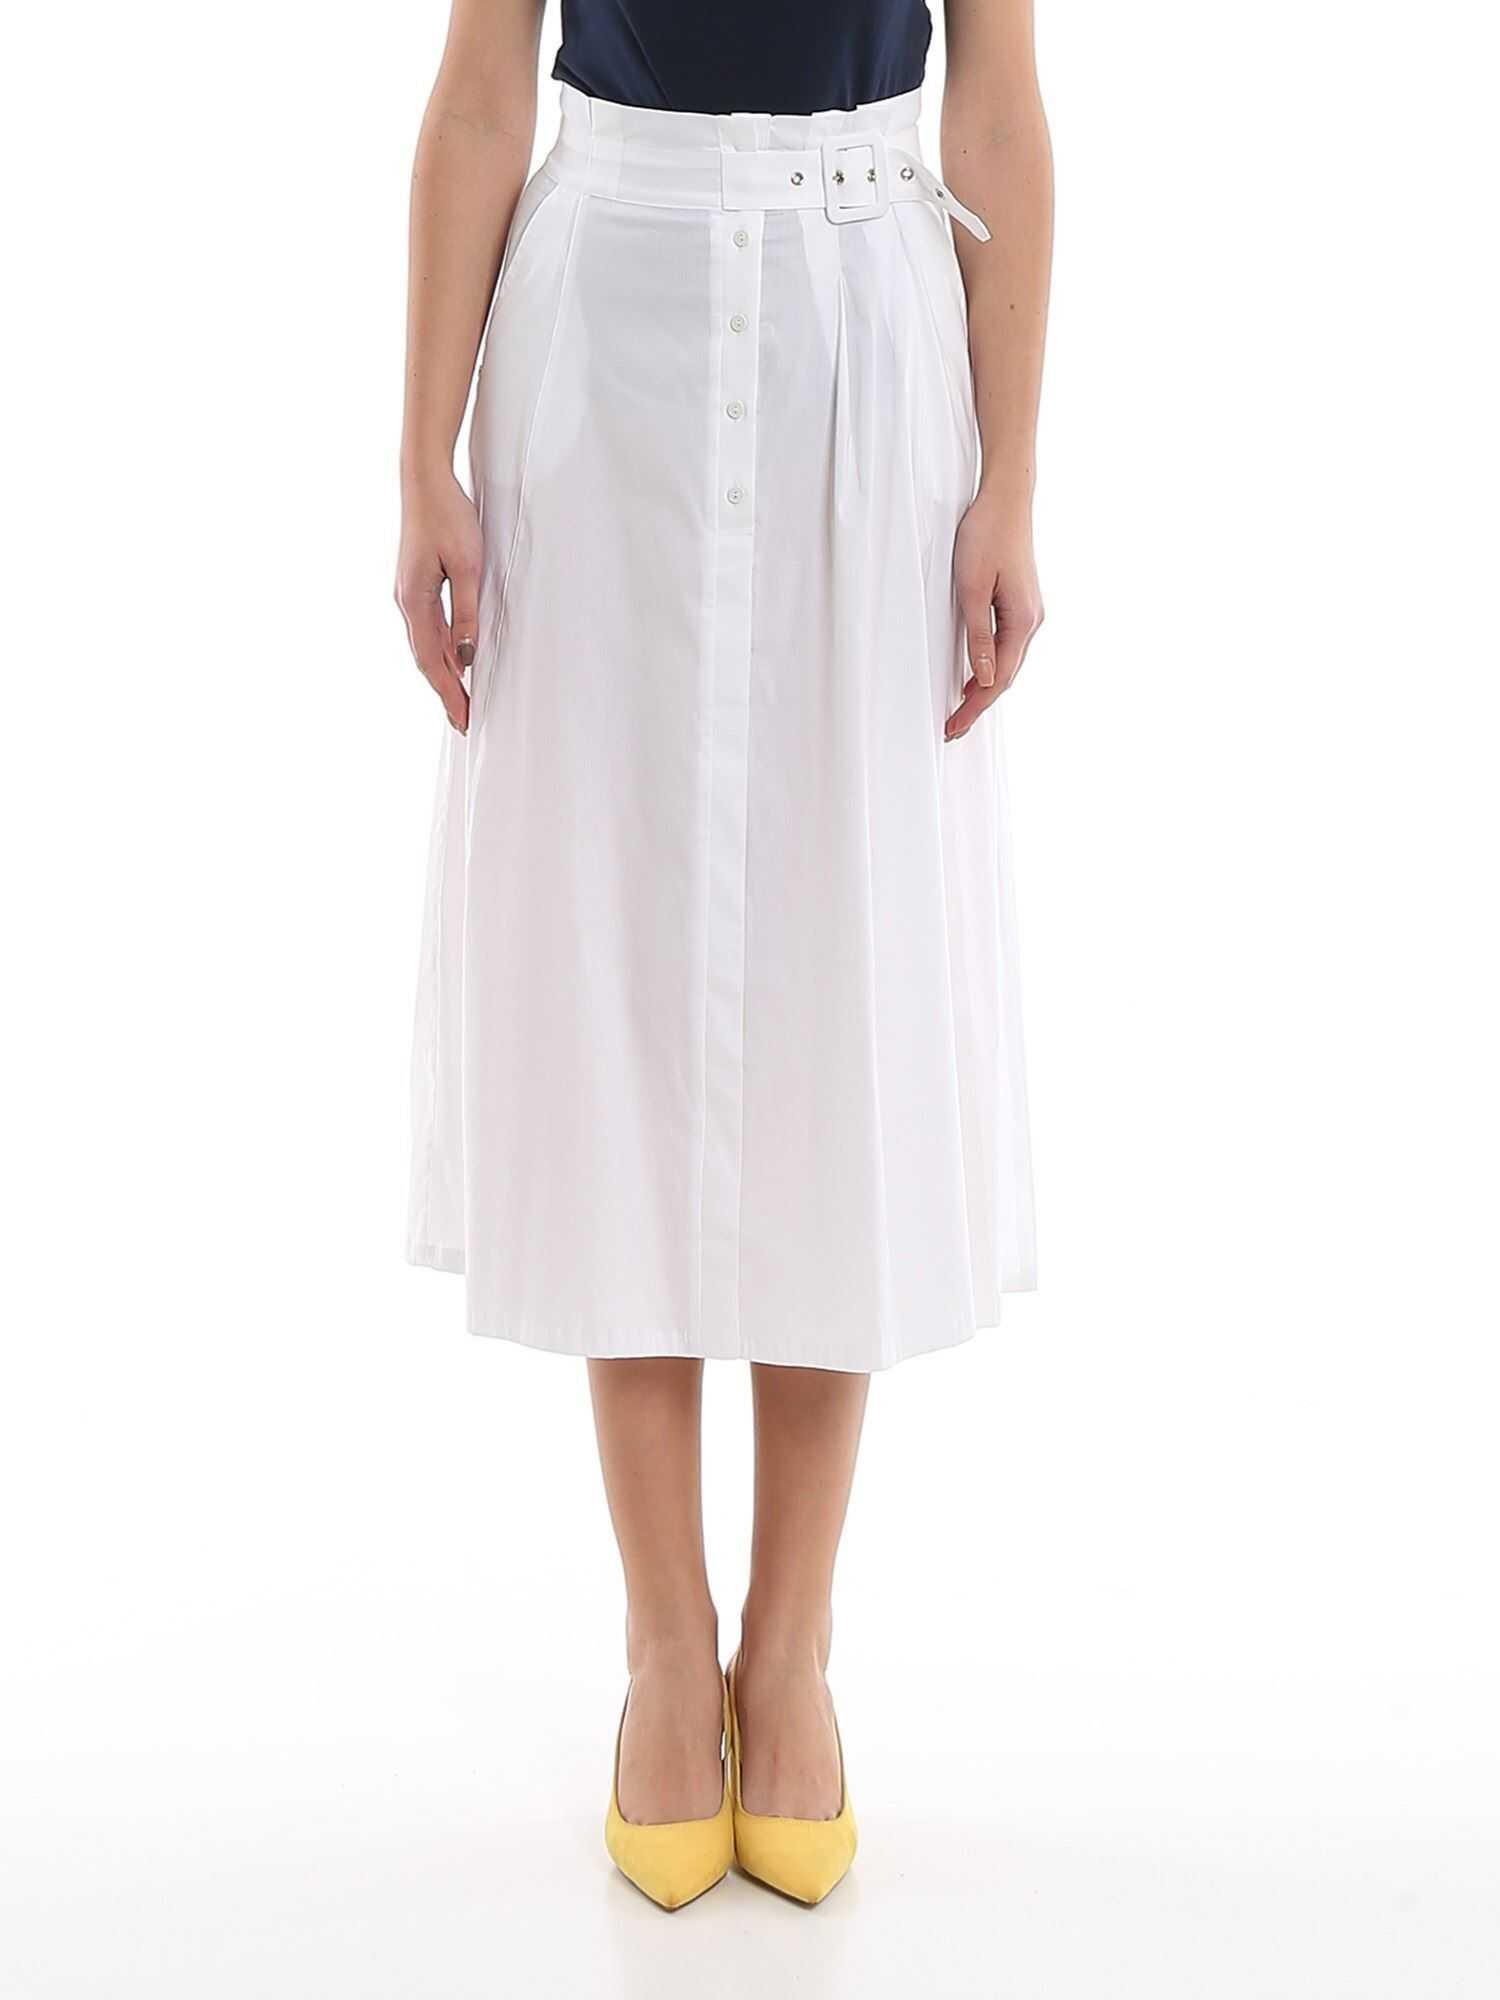 Patrizia Pepe Jersey Skirt In White White